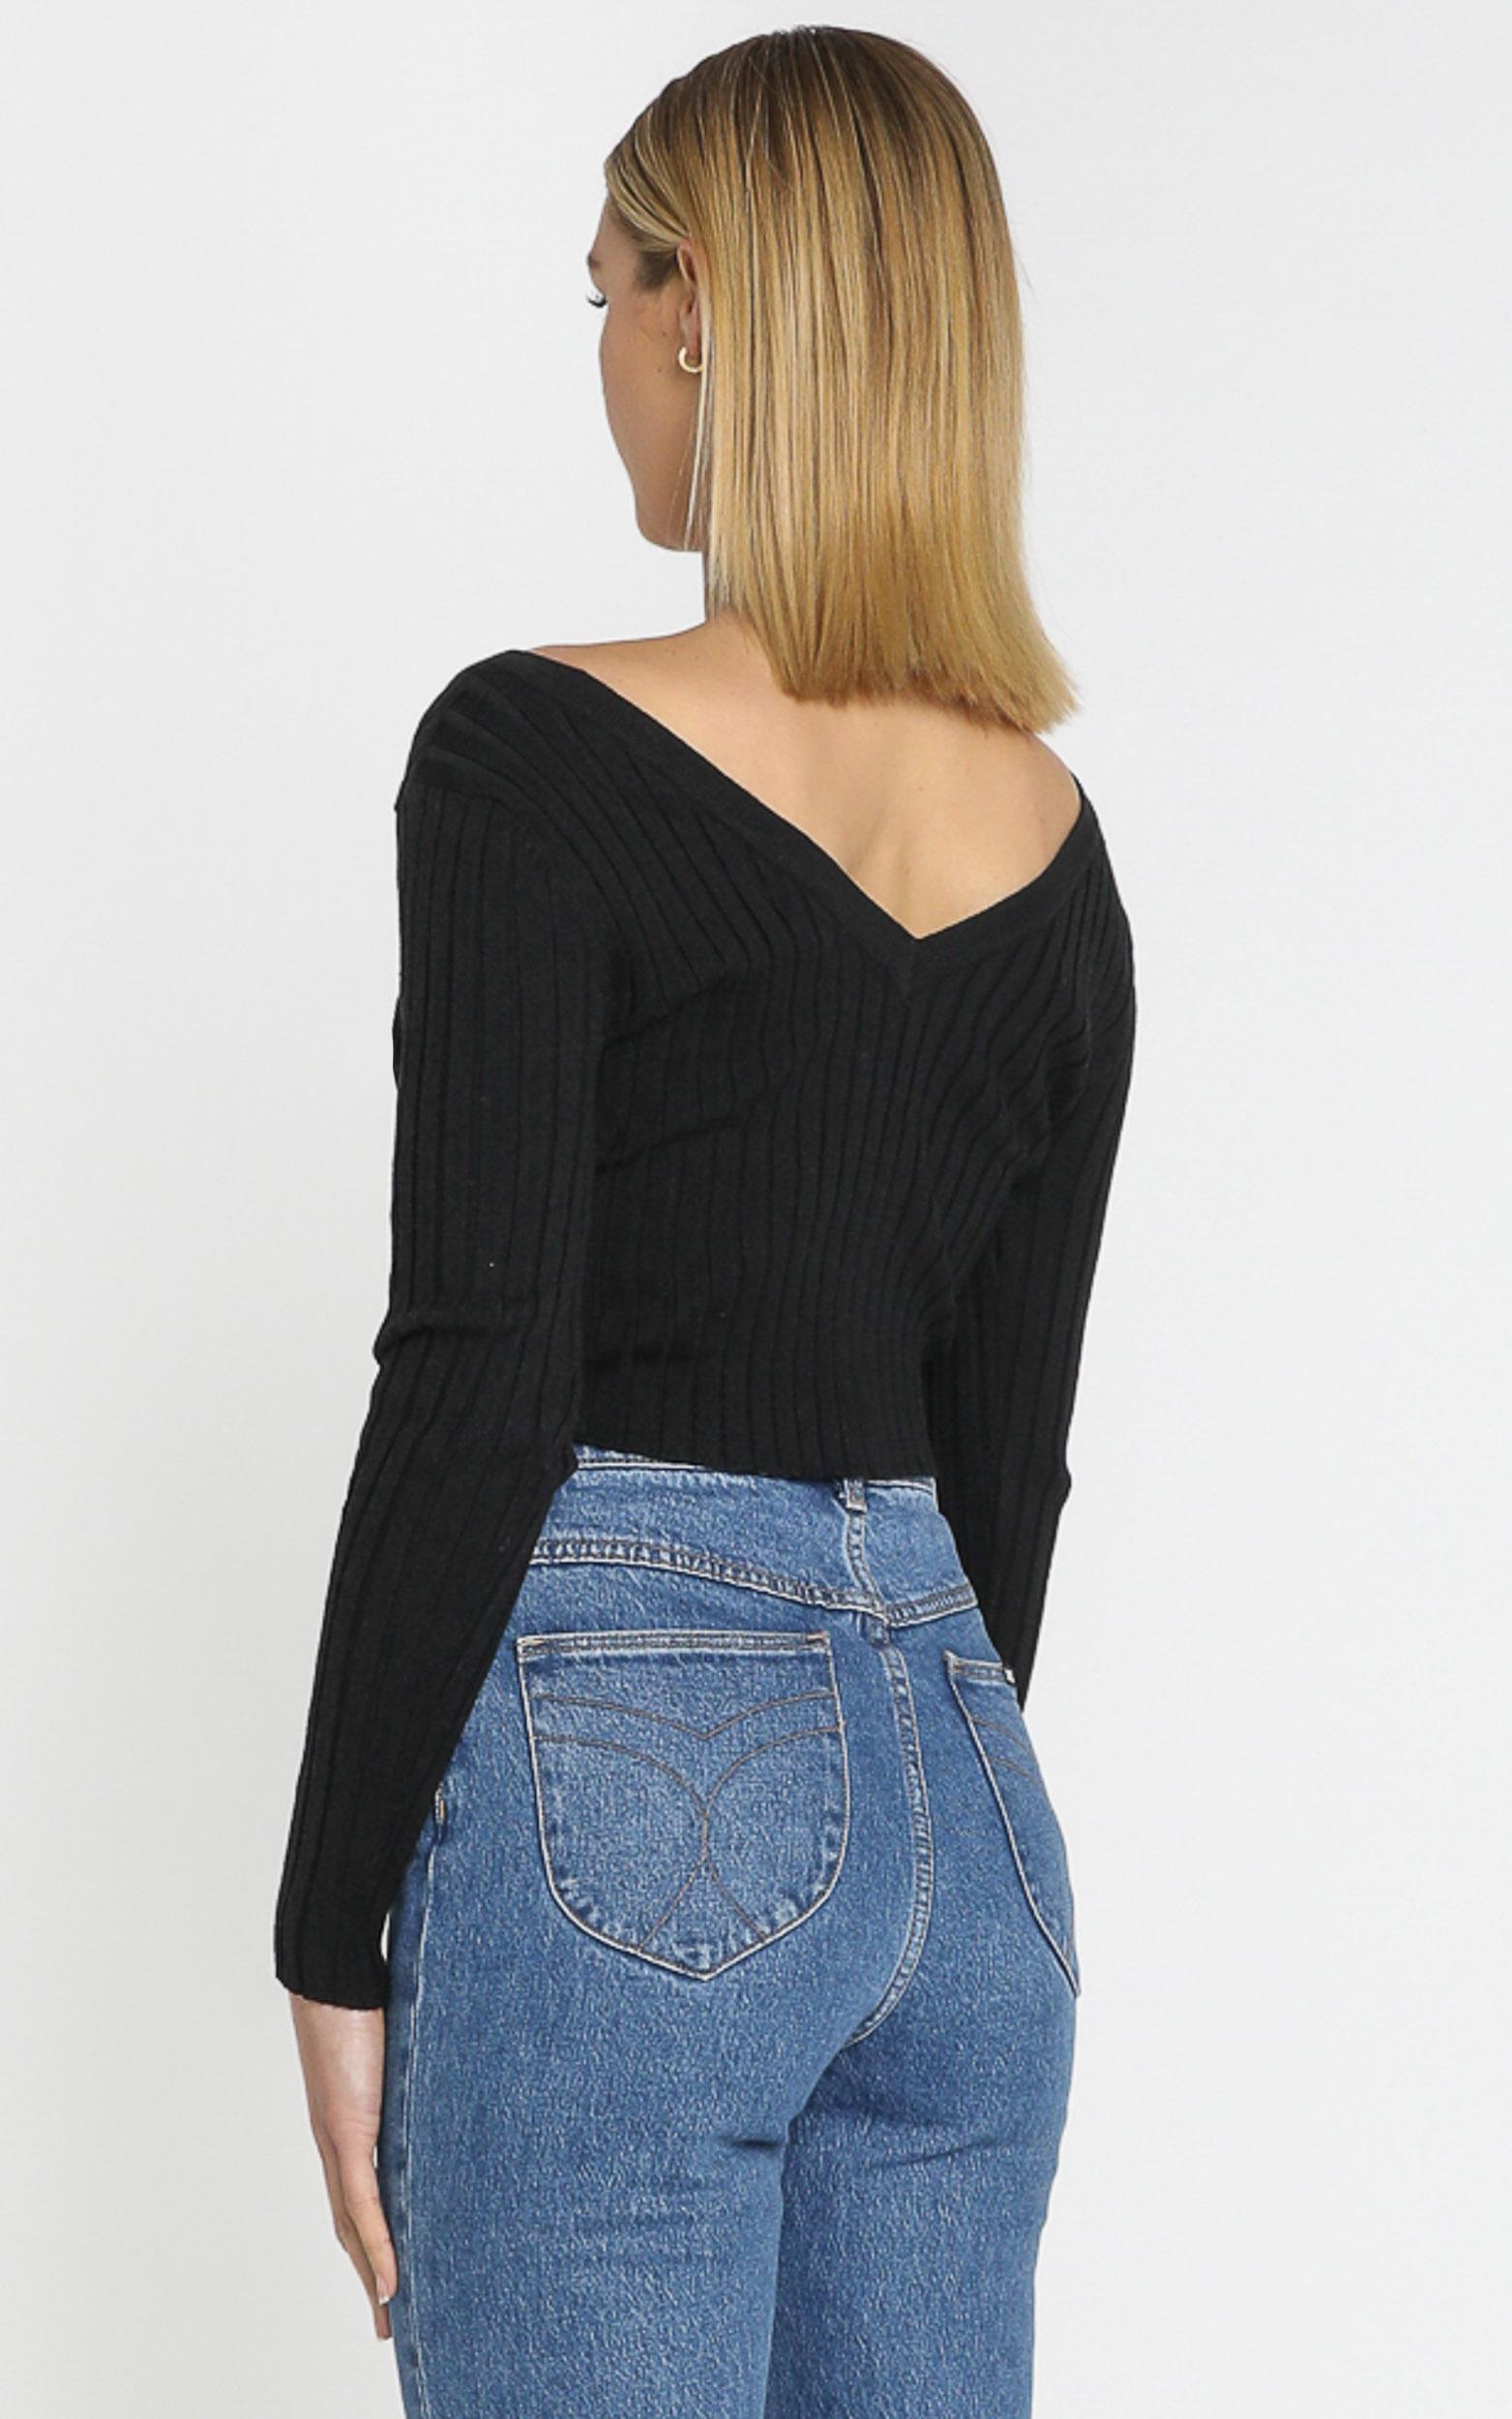 Agnese Knit Top in Black - 8 (S), Black, hi-res image number null